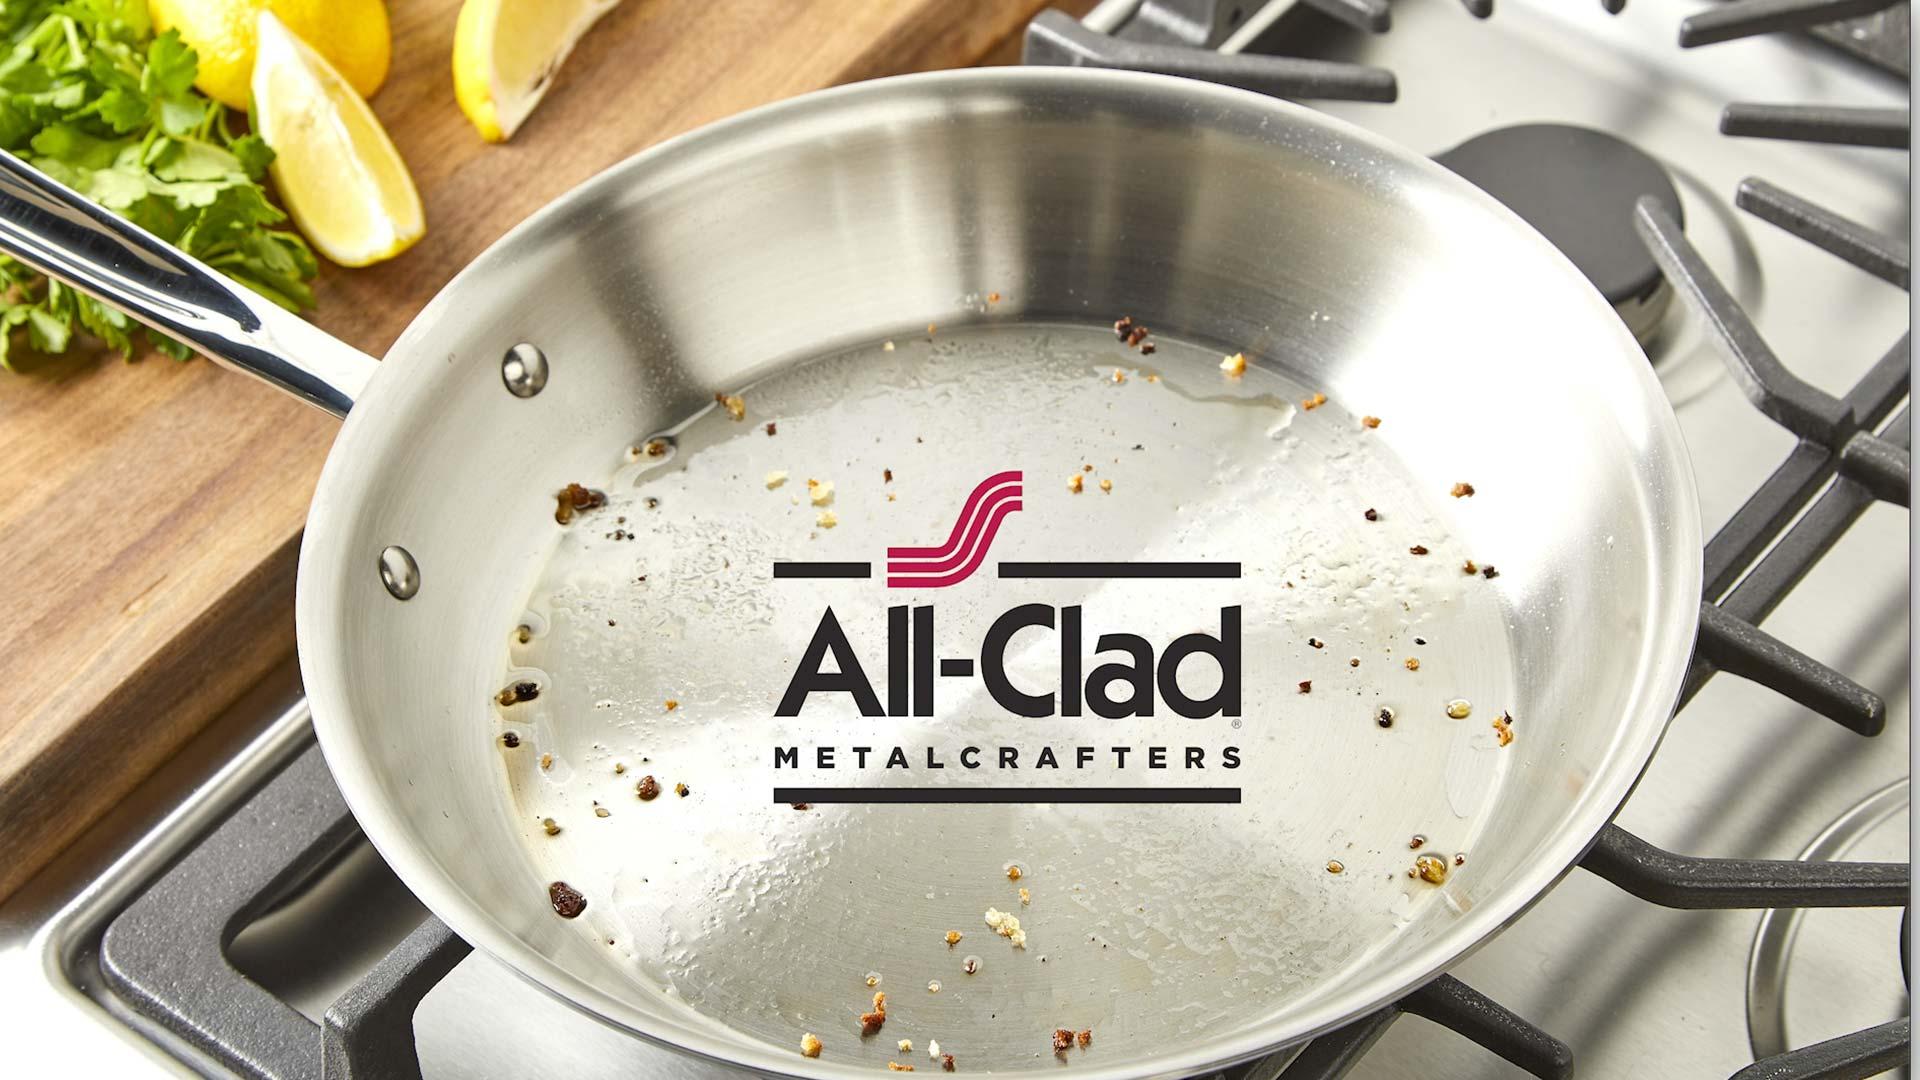 All-Clad social crab cake image